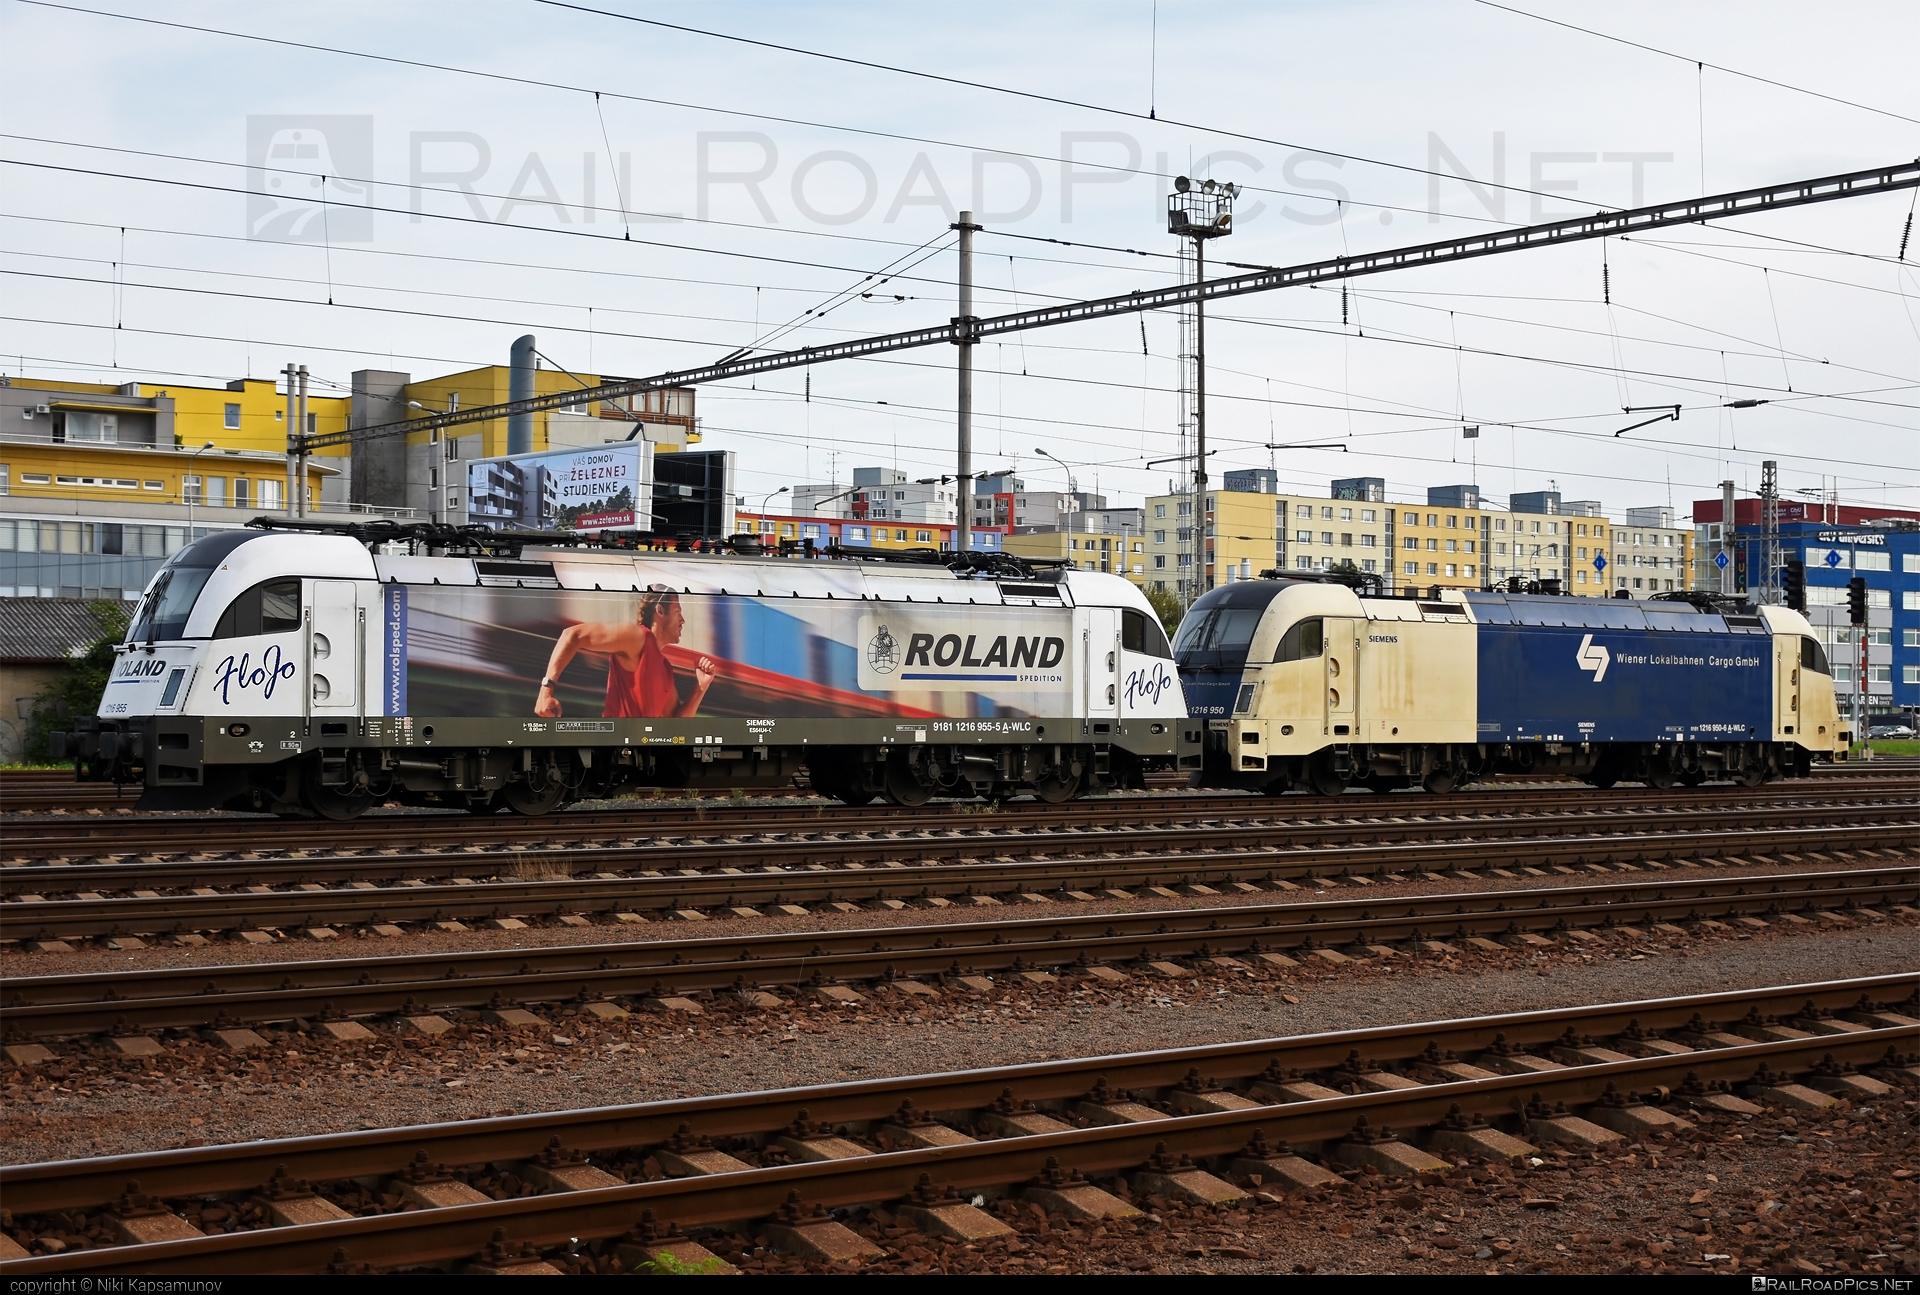 Siemens ES 64 U4 - 1216 955 operated by Wiener Lokalbahnen Cargo GmbH #FloJo #es64 #es64u #es64u4 #eurosprinter #roland #rolandspedition #siemens #siemenses64 #siemenses64u #siemenses64u4 #siemenstaurus #tauruslocomotive #wienerlokalbahnencargo #wienerlokalbahnencargogmbh #wlc